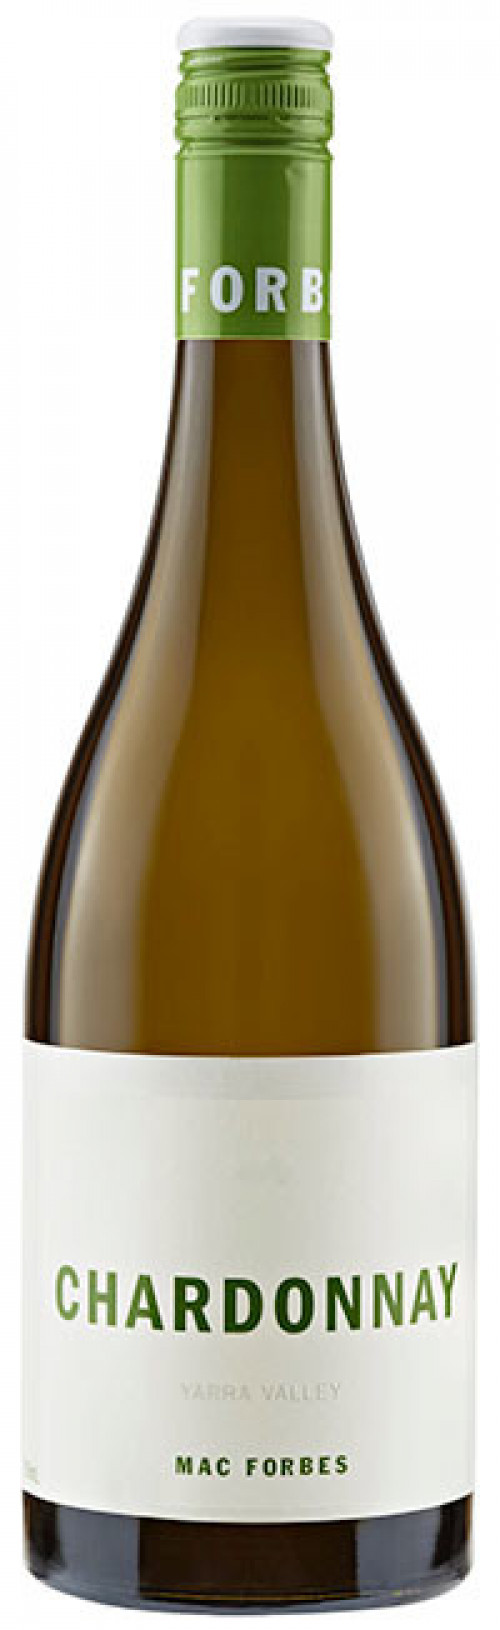 2018 Mac Forbes Yarra Valley Chardonnay 750ml